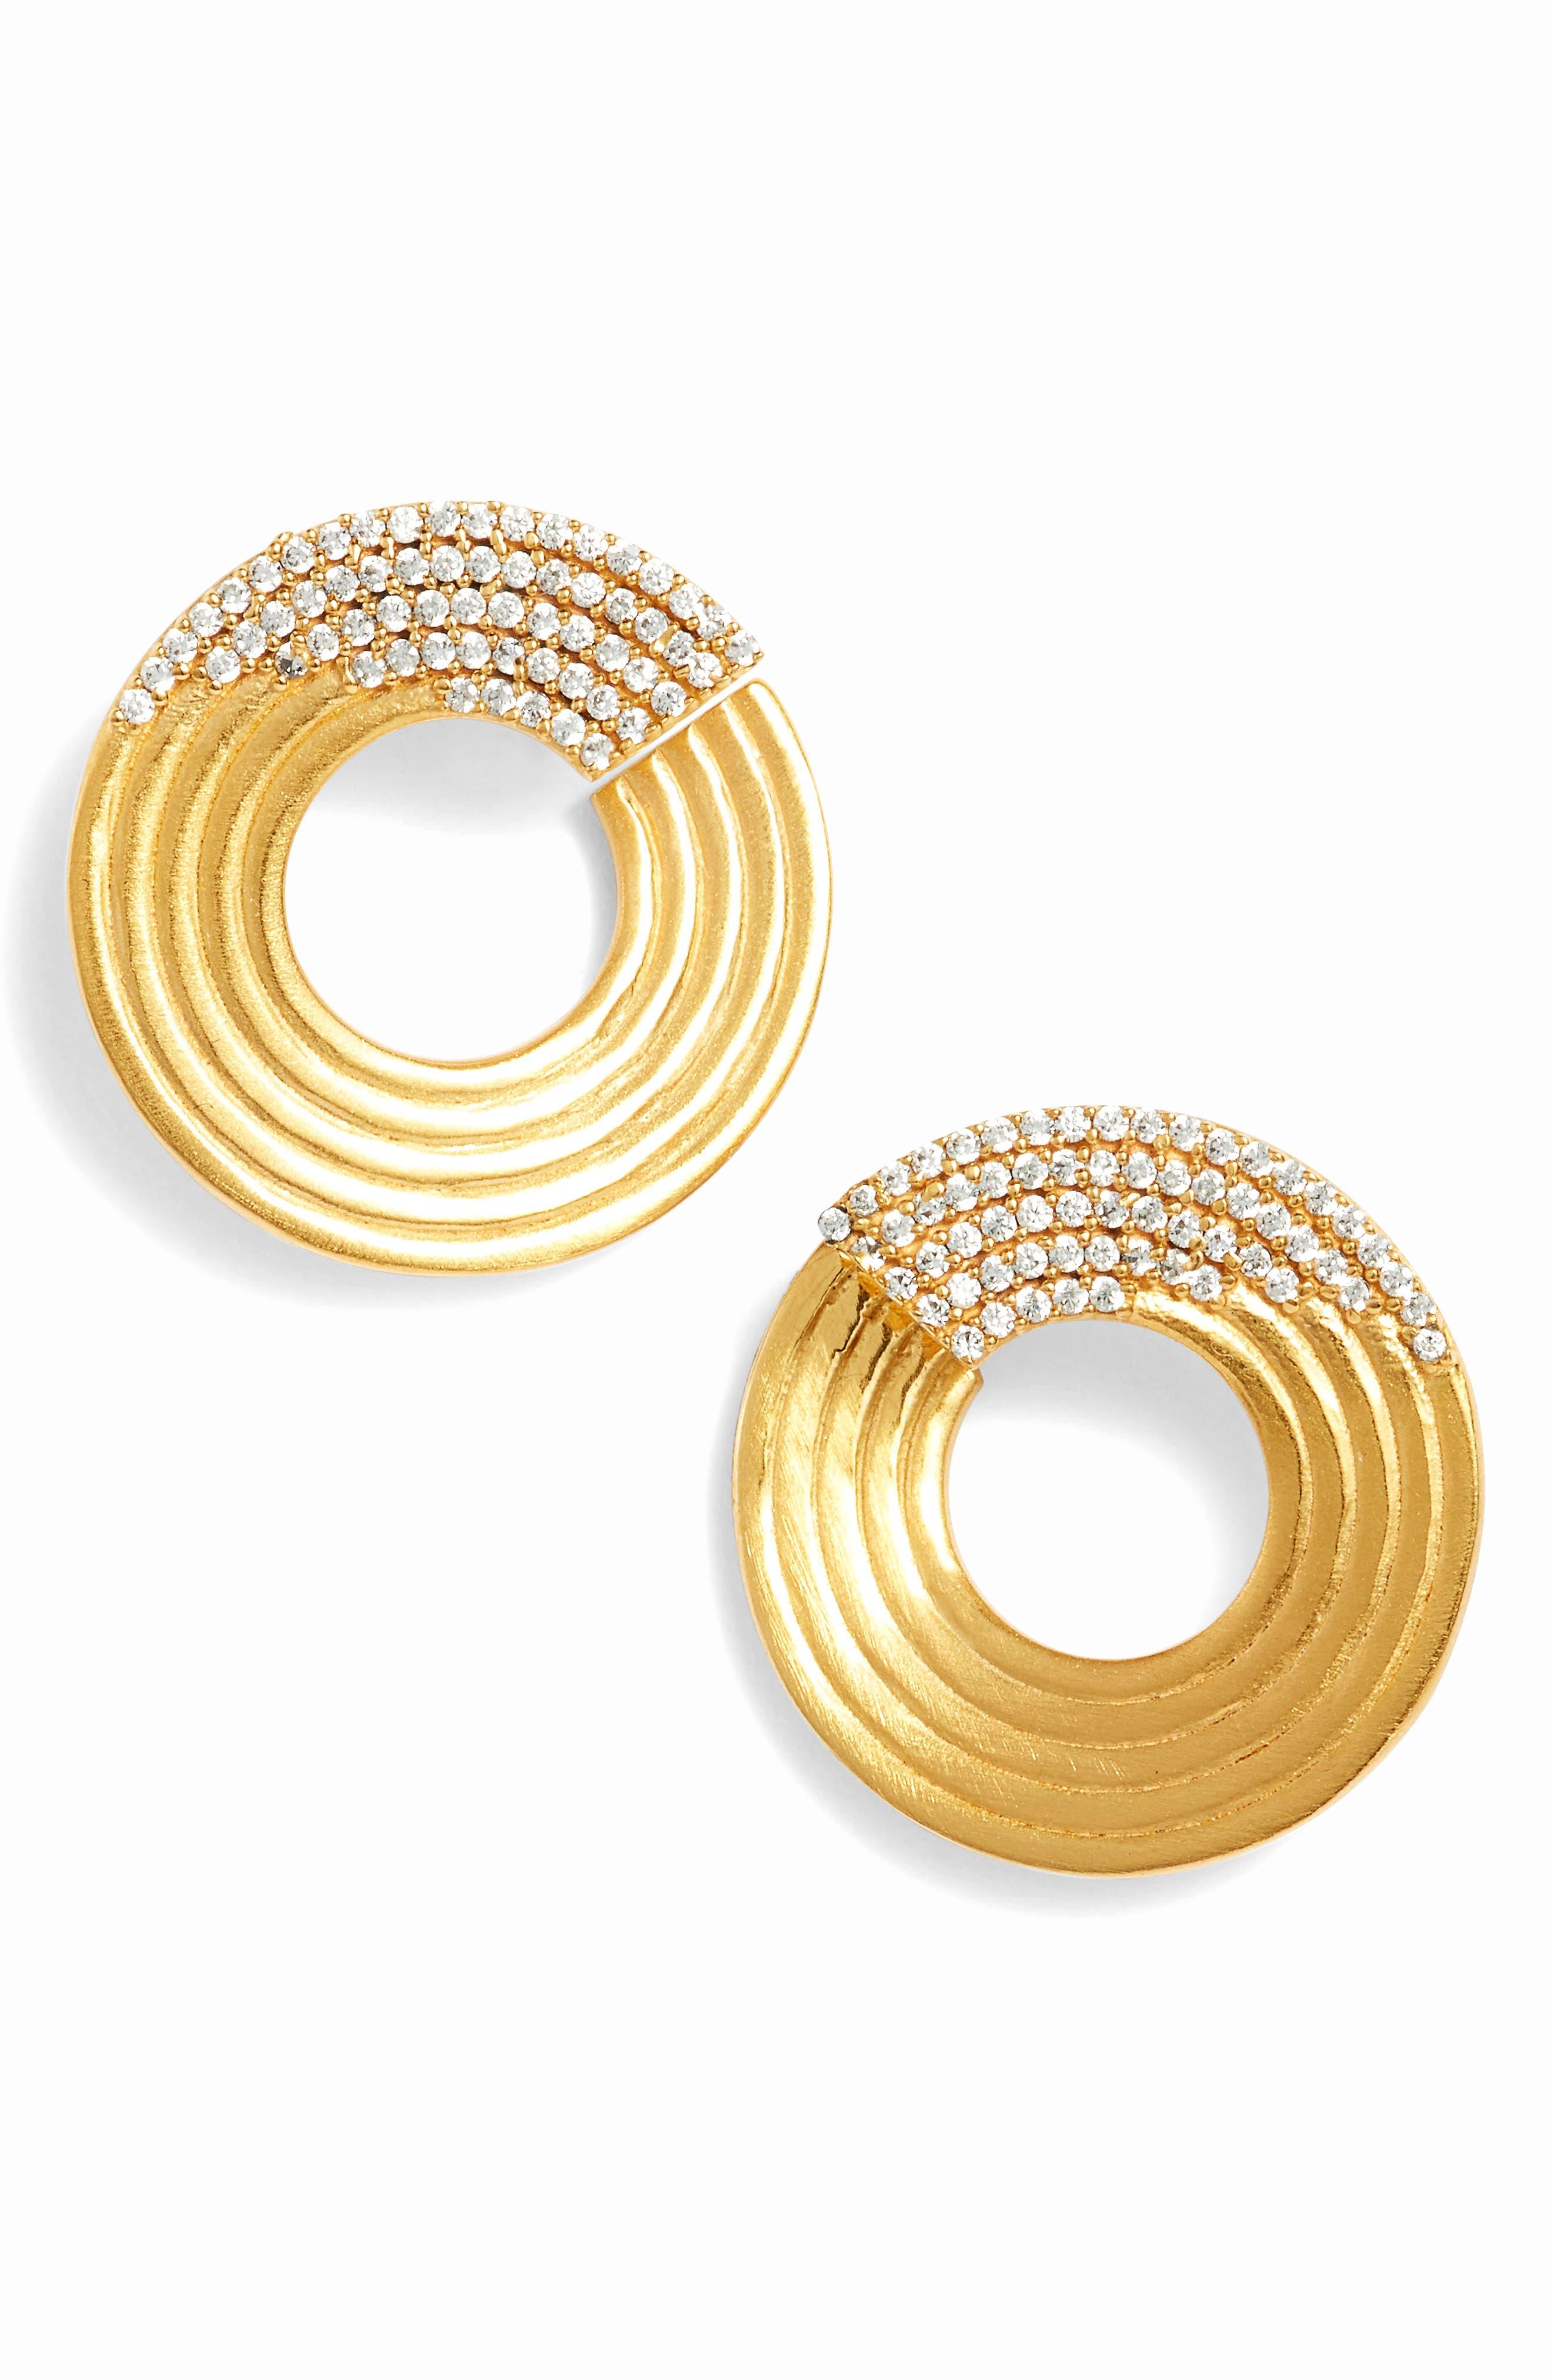 Alternate Image 1 Selected - Dean Davidson Zaha Stud Earrings